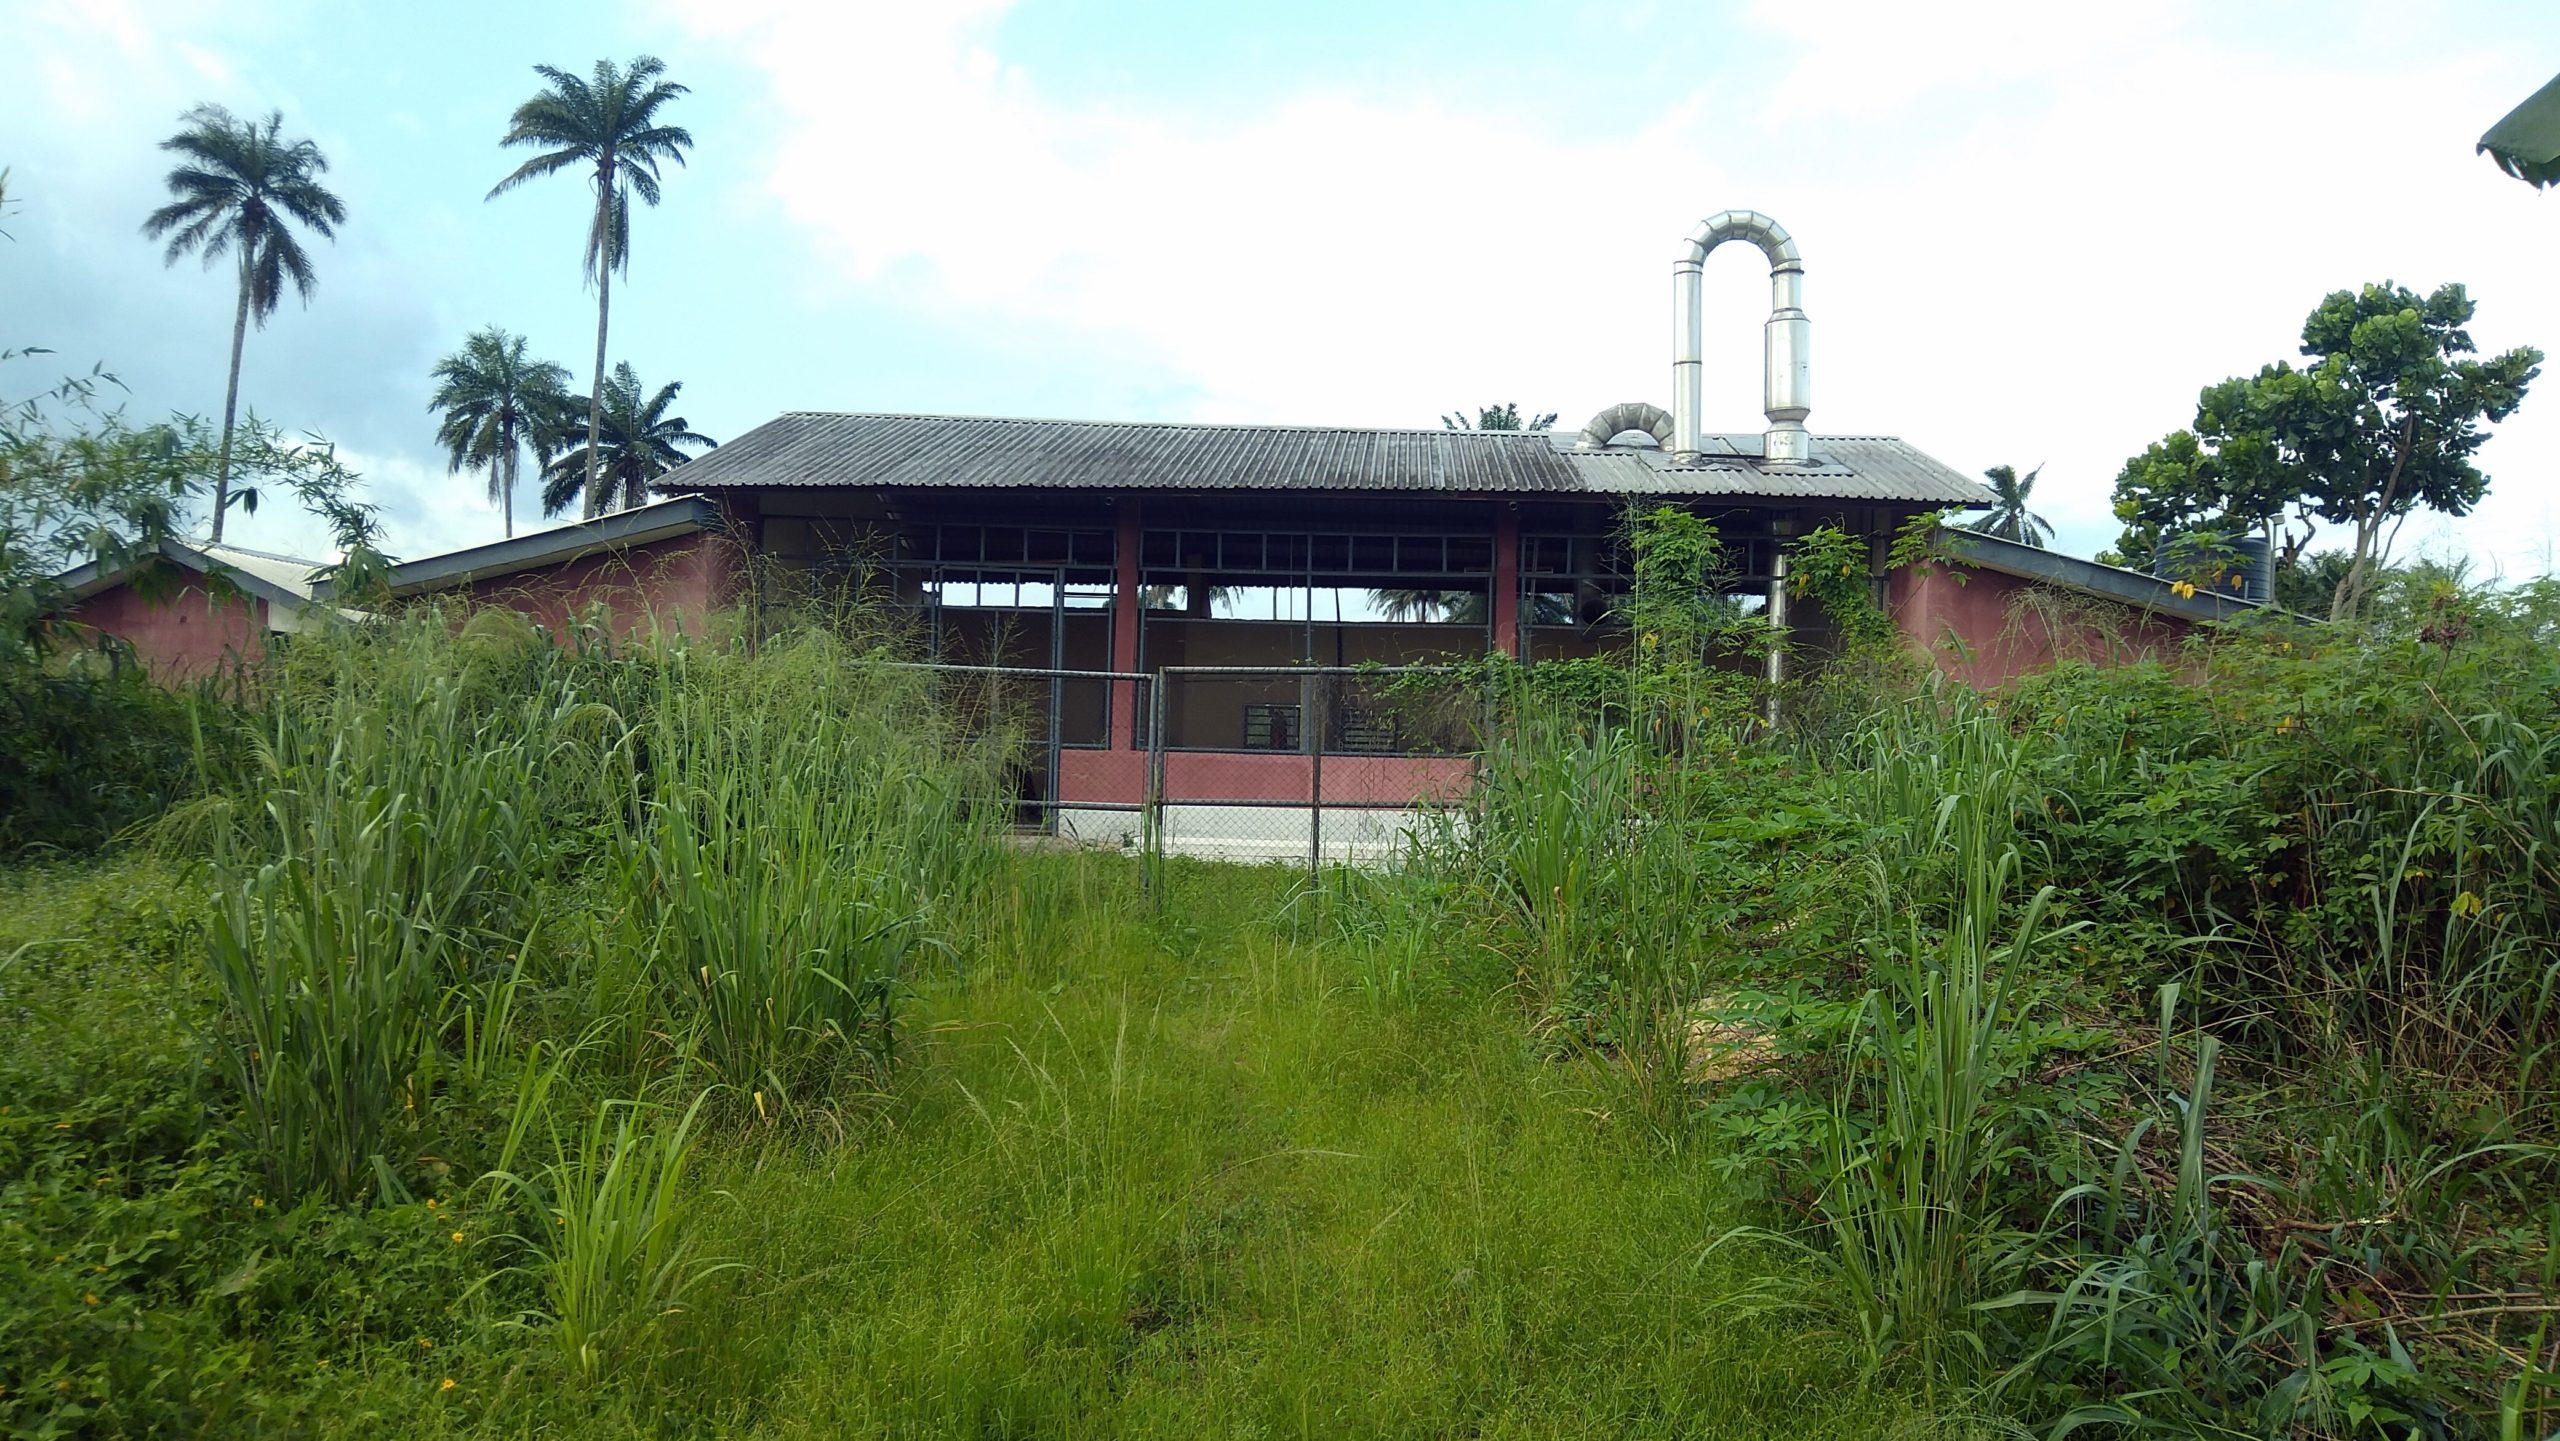 Abandoned cassava processing factory in Ikot Ekang, Abak